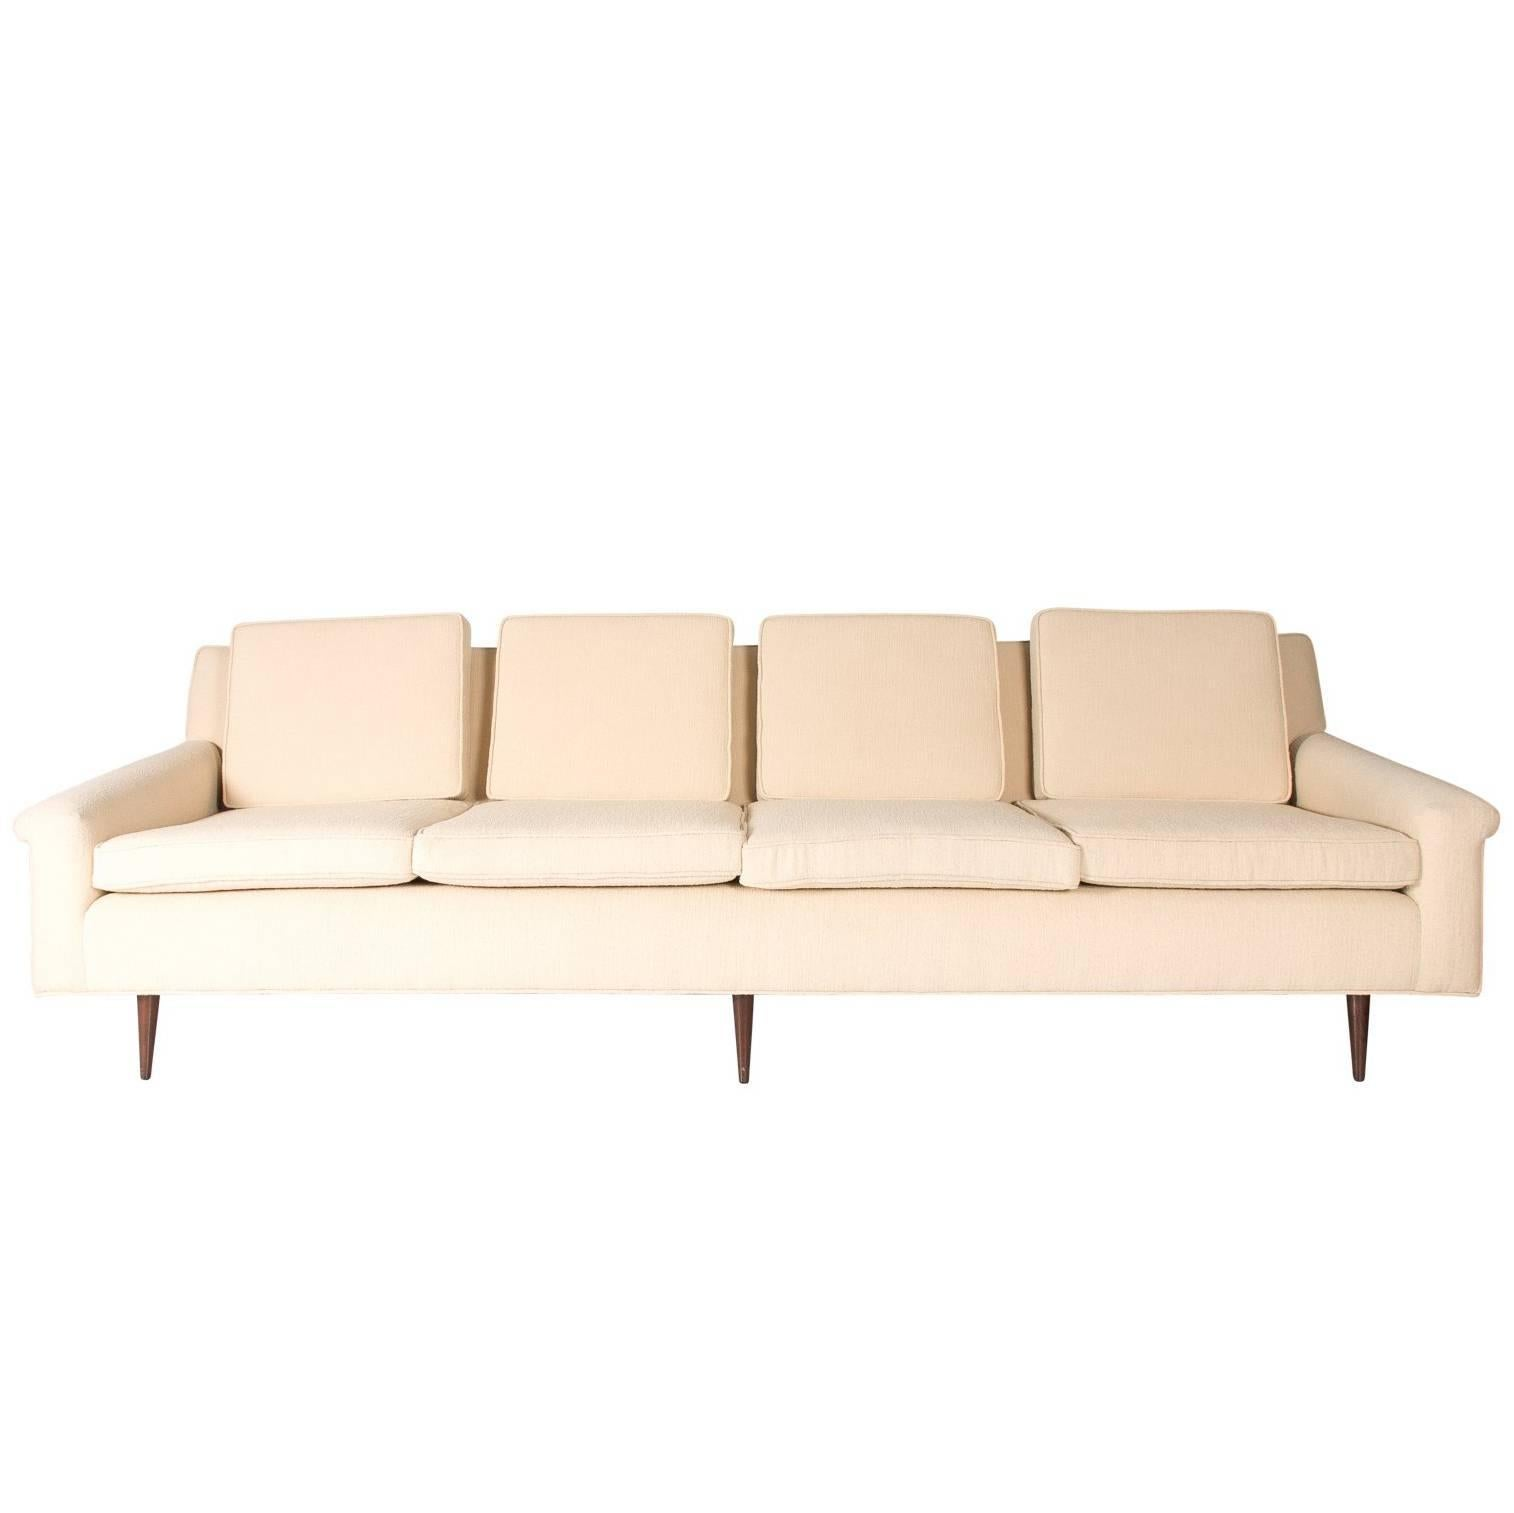 Milo Baughman Sofa for Thayer Coggin For Sale at 1stdibs